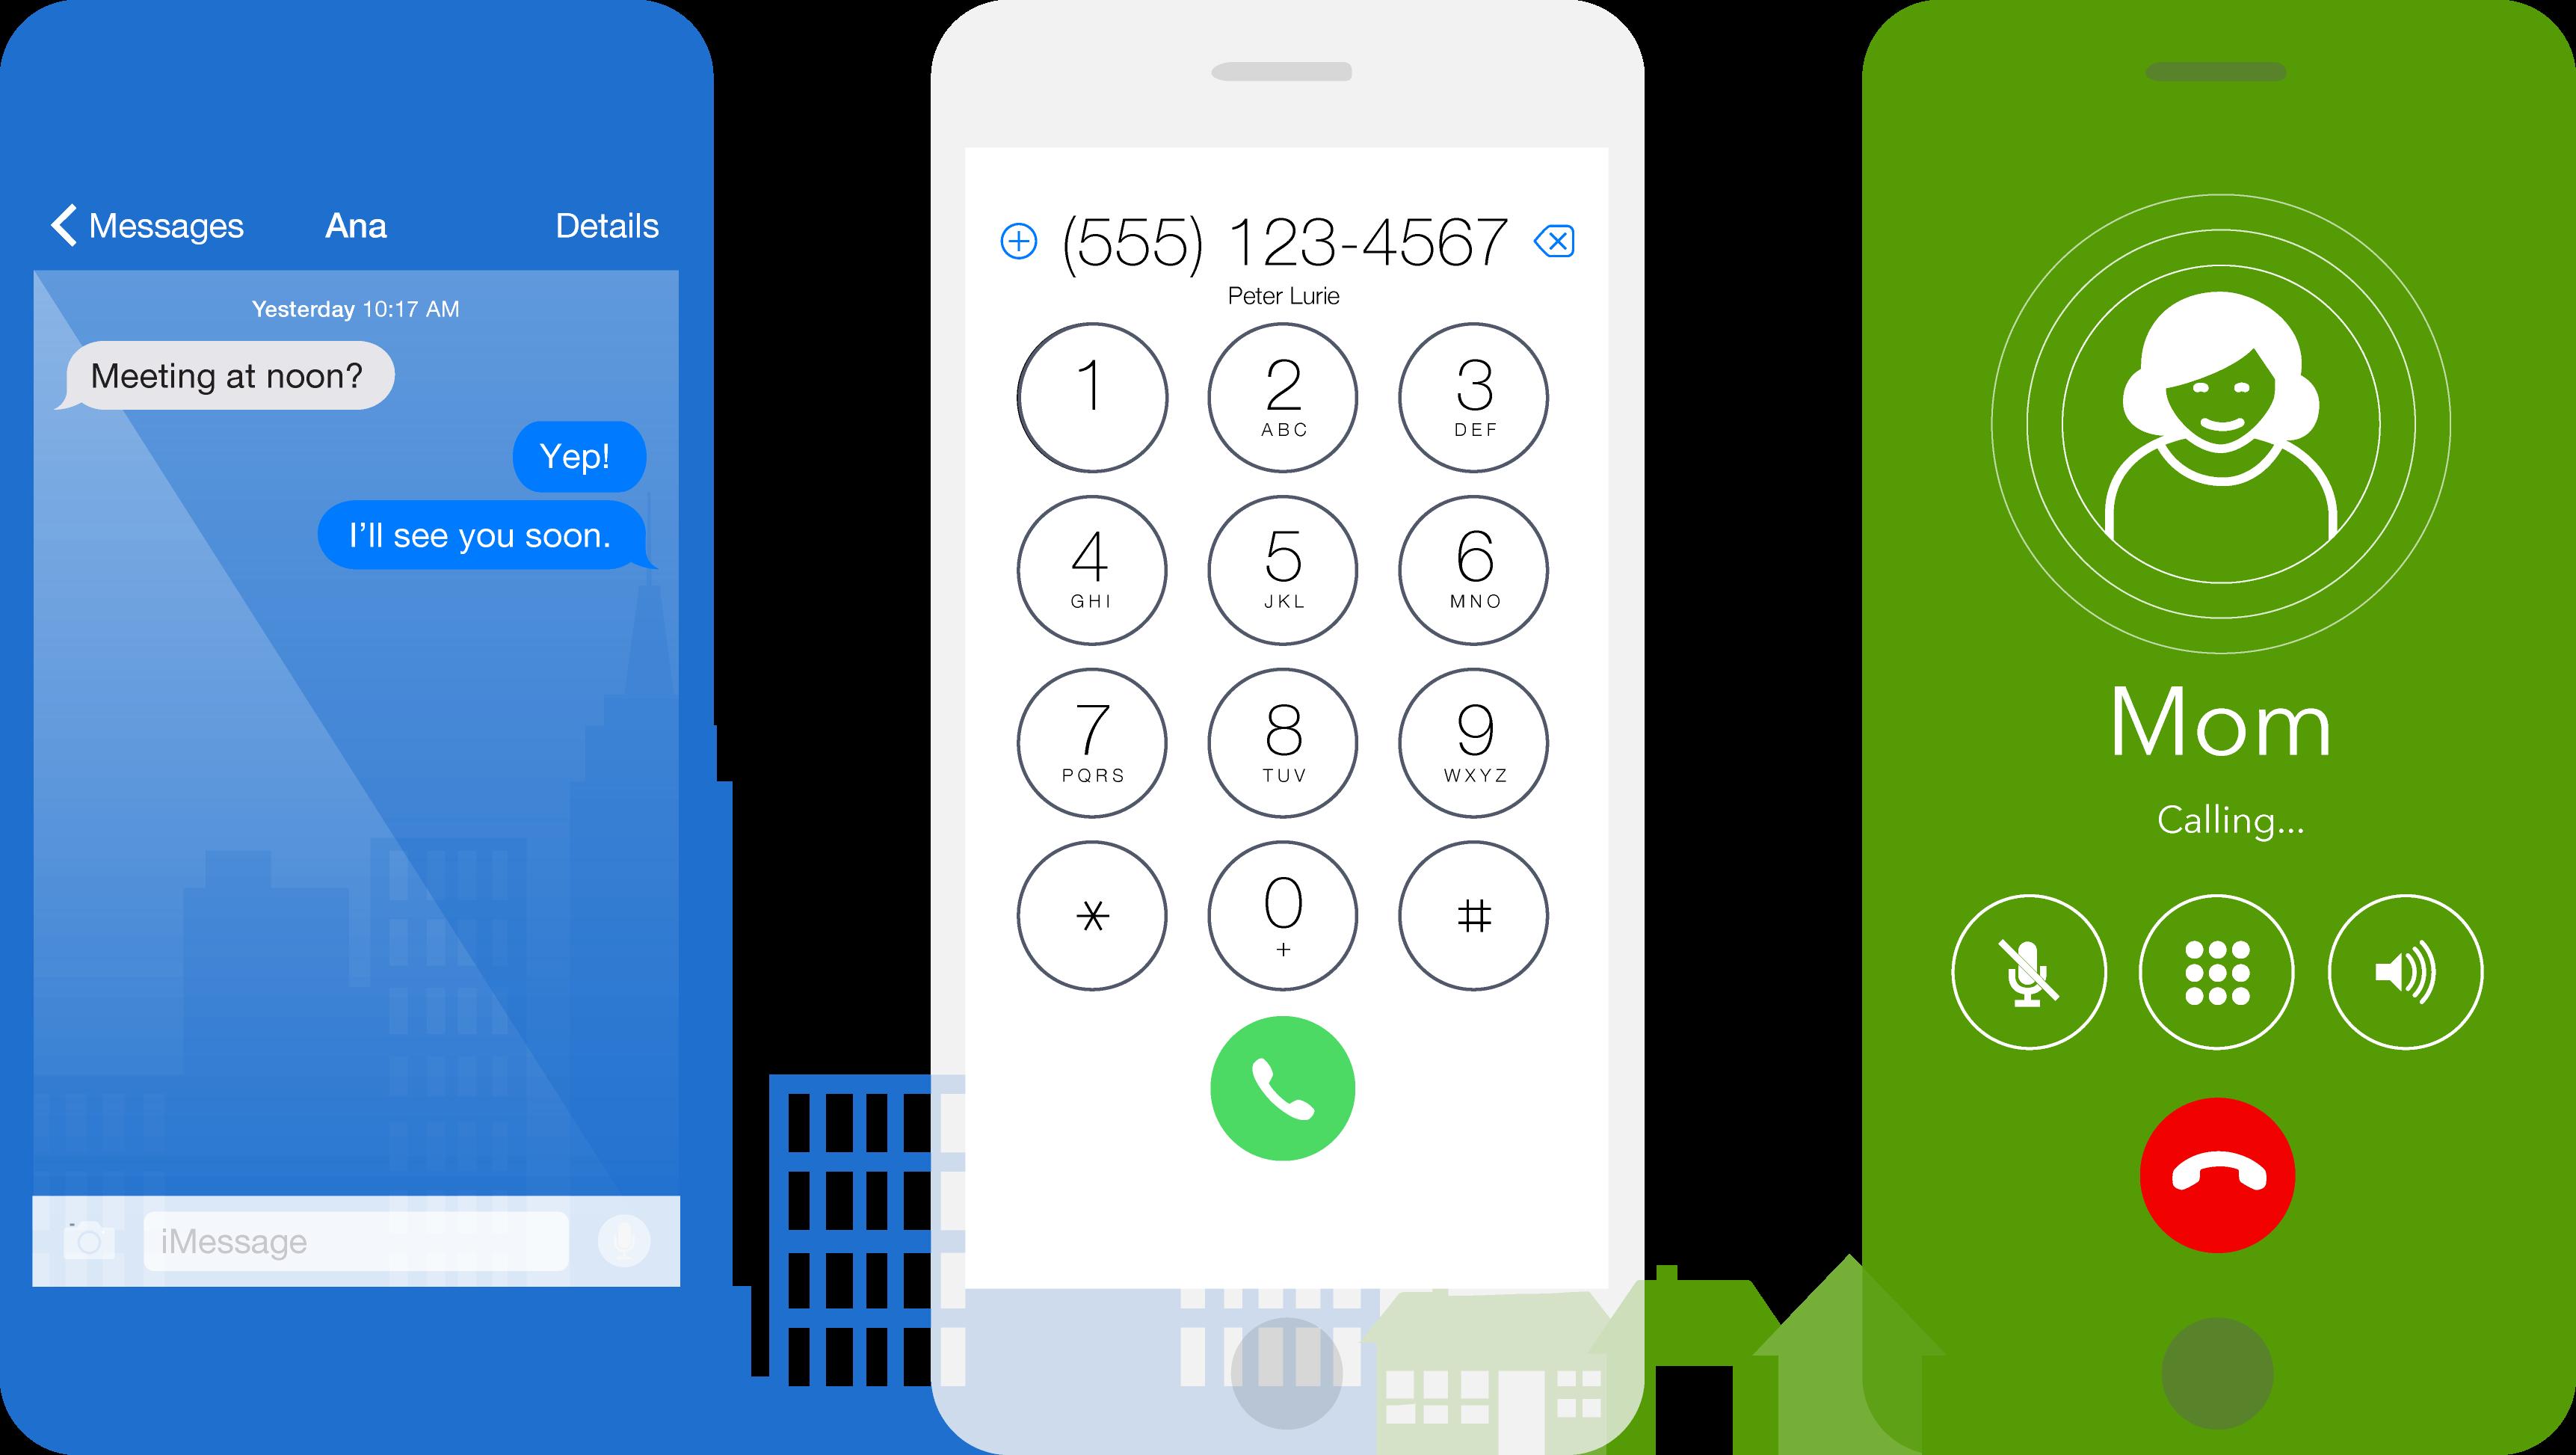 Beroemd real phone numbers - phone number services number club, santa s  @MO73